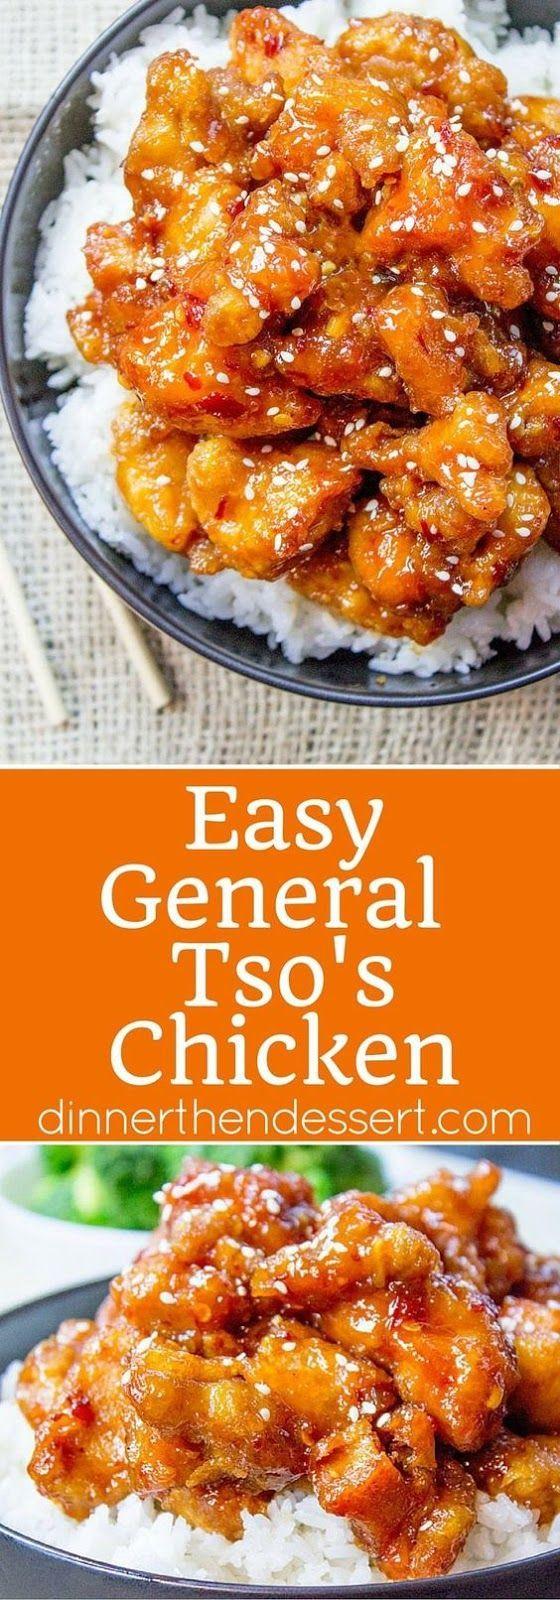 General Tso's Chicken: